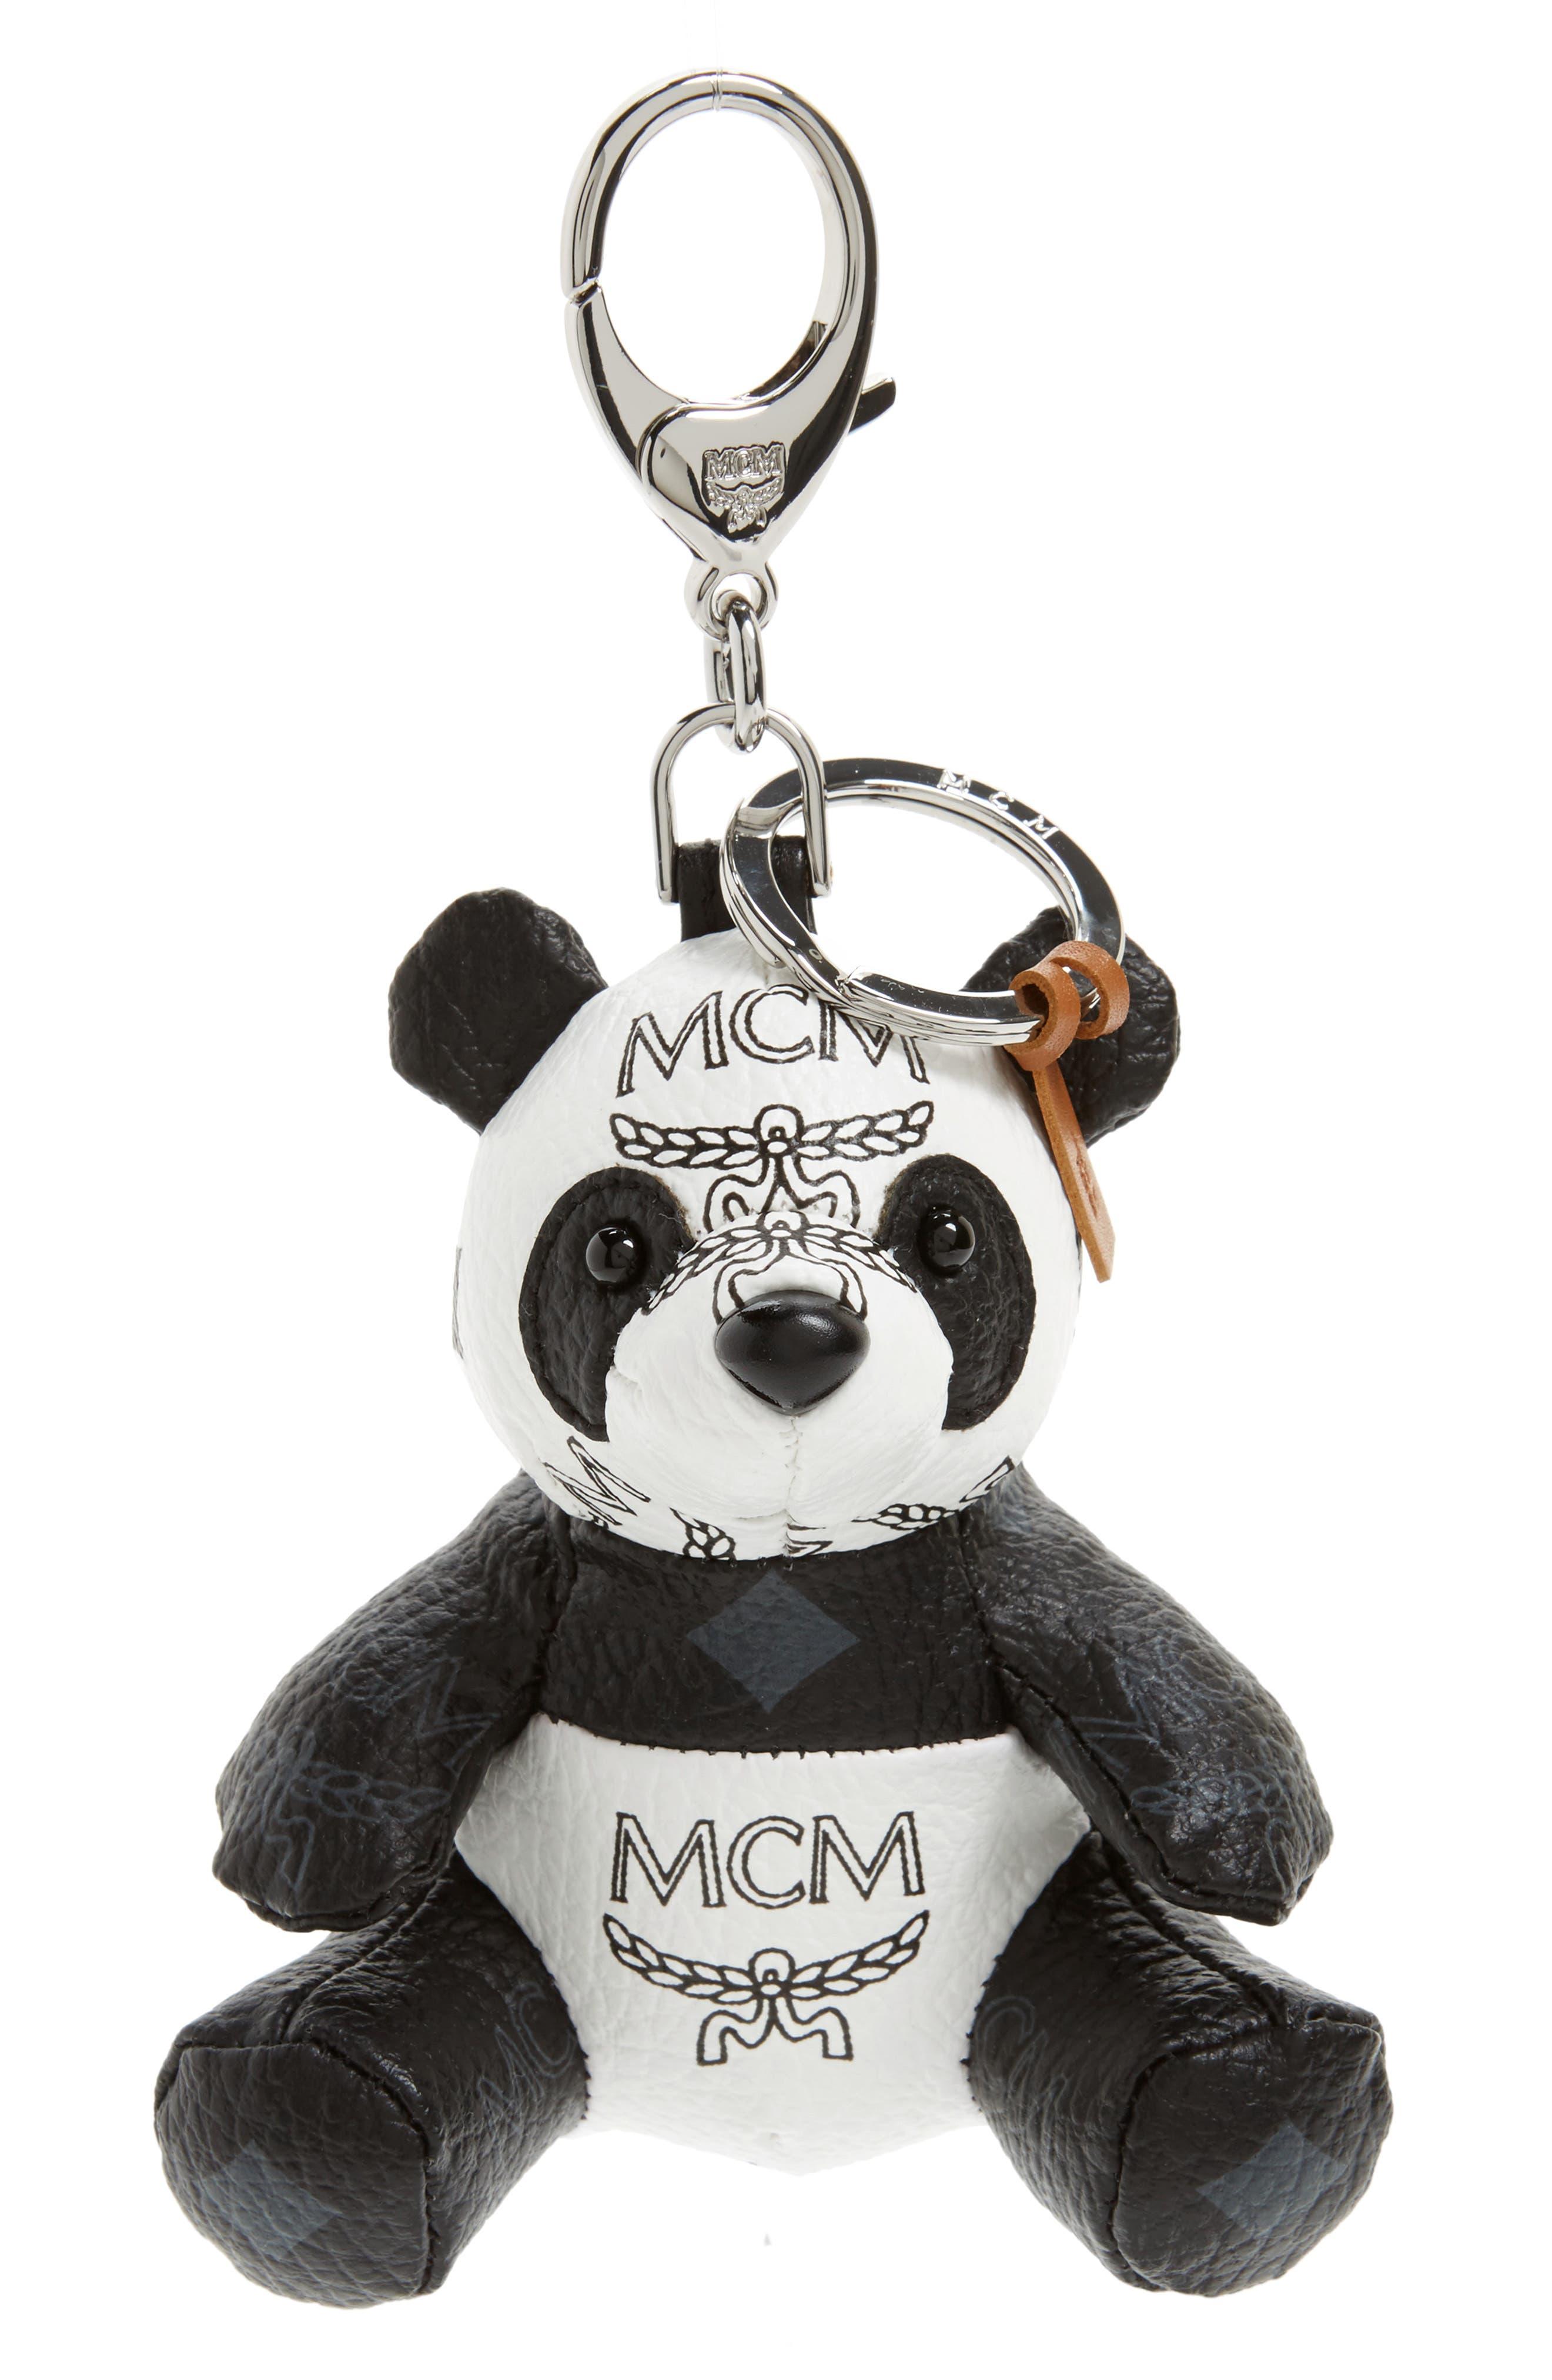 MCM Panda Bag Charm